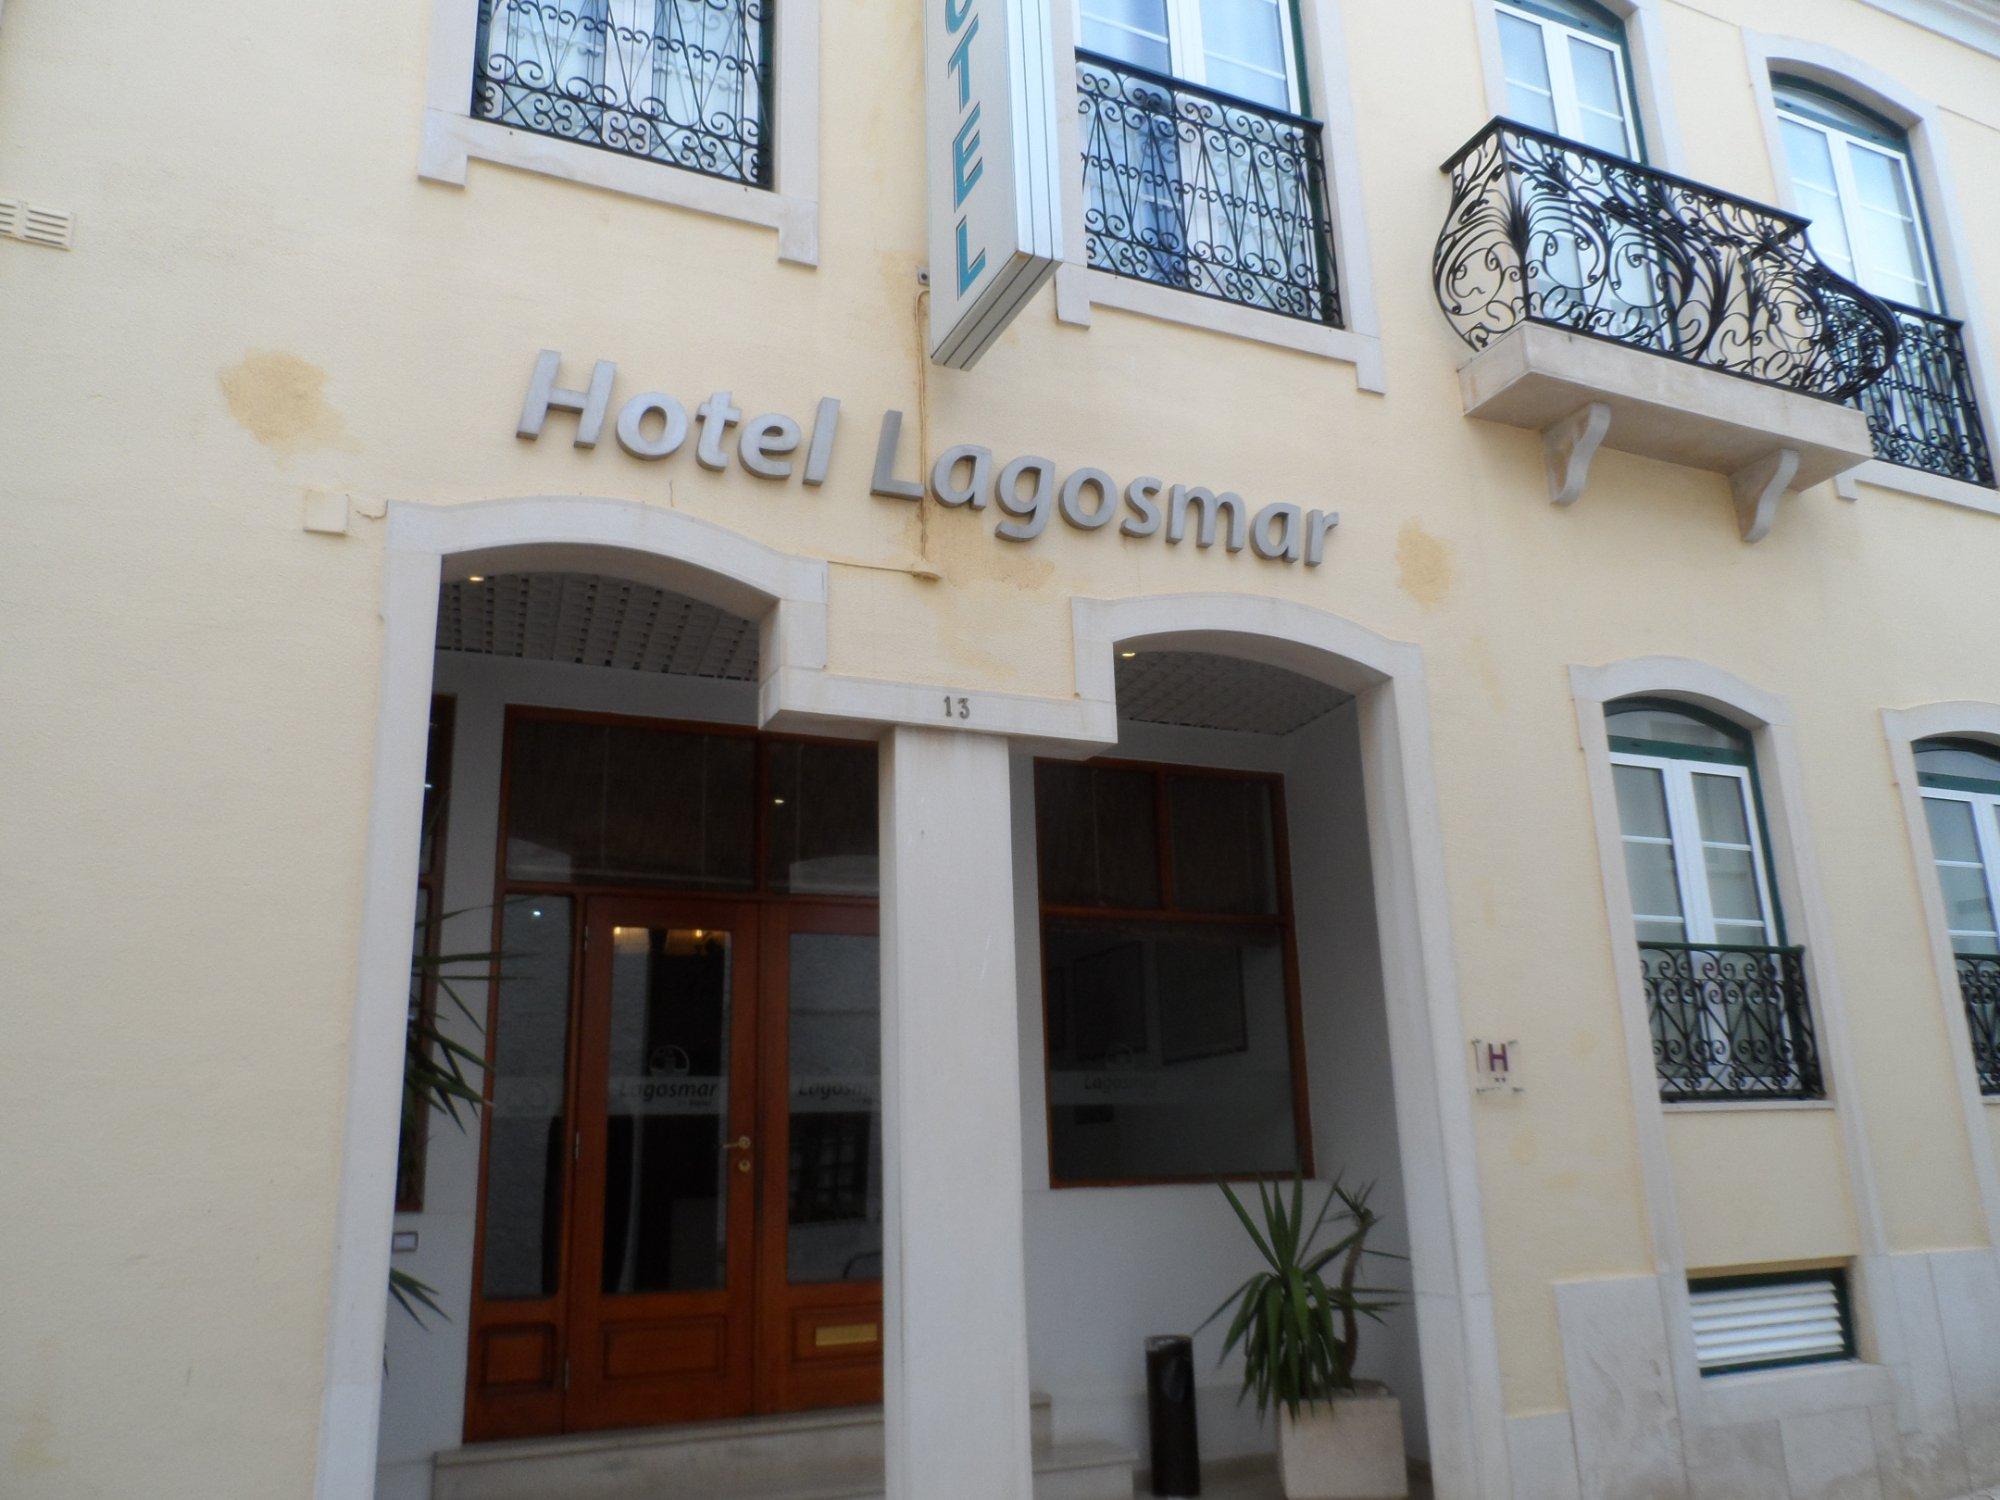 Lagosmar Hotel